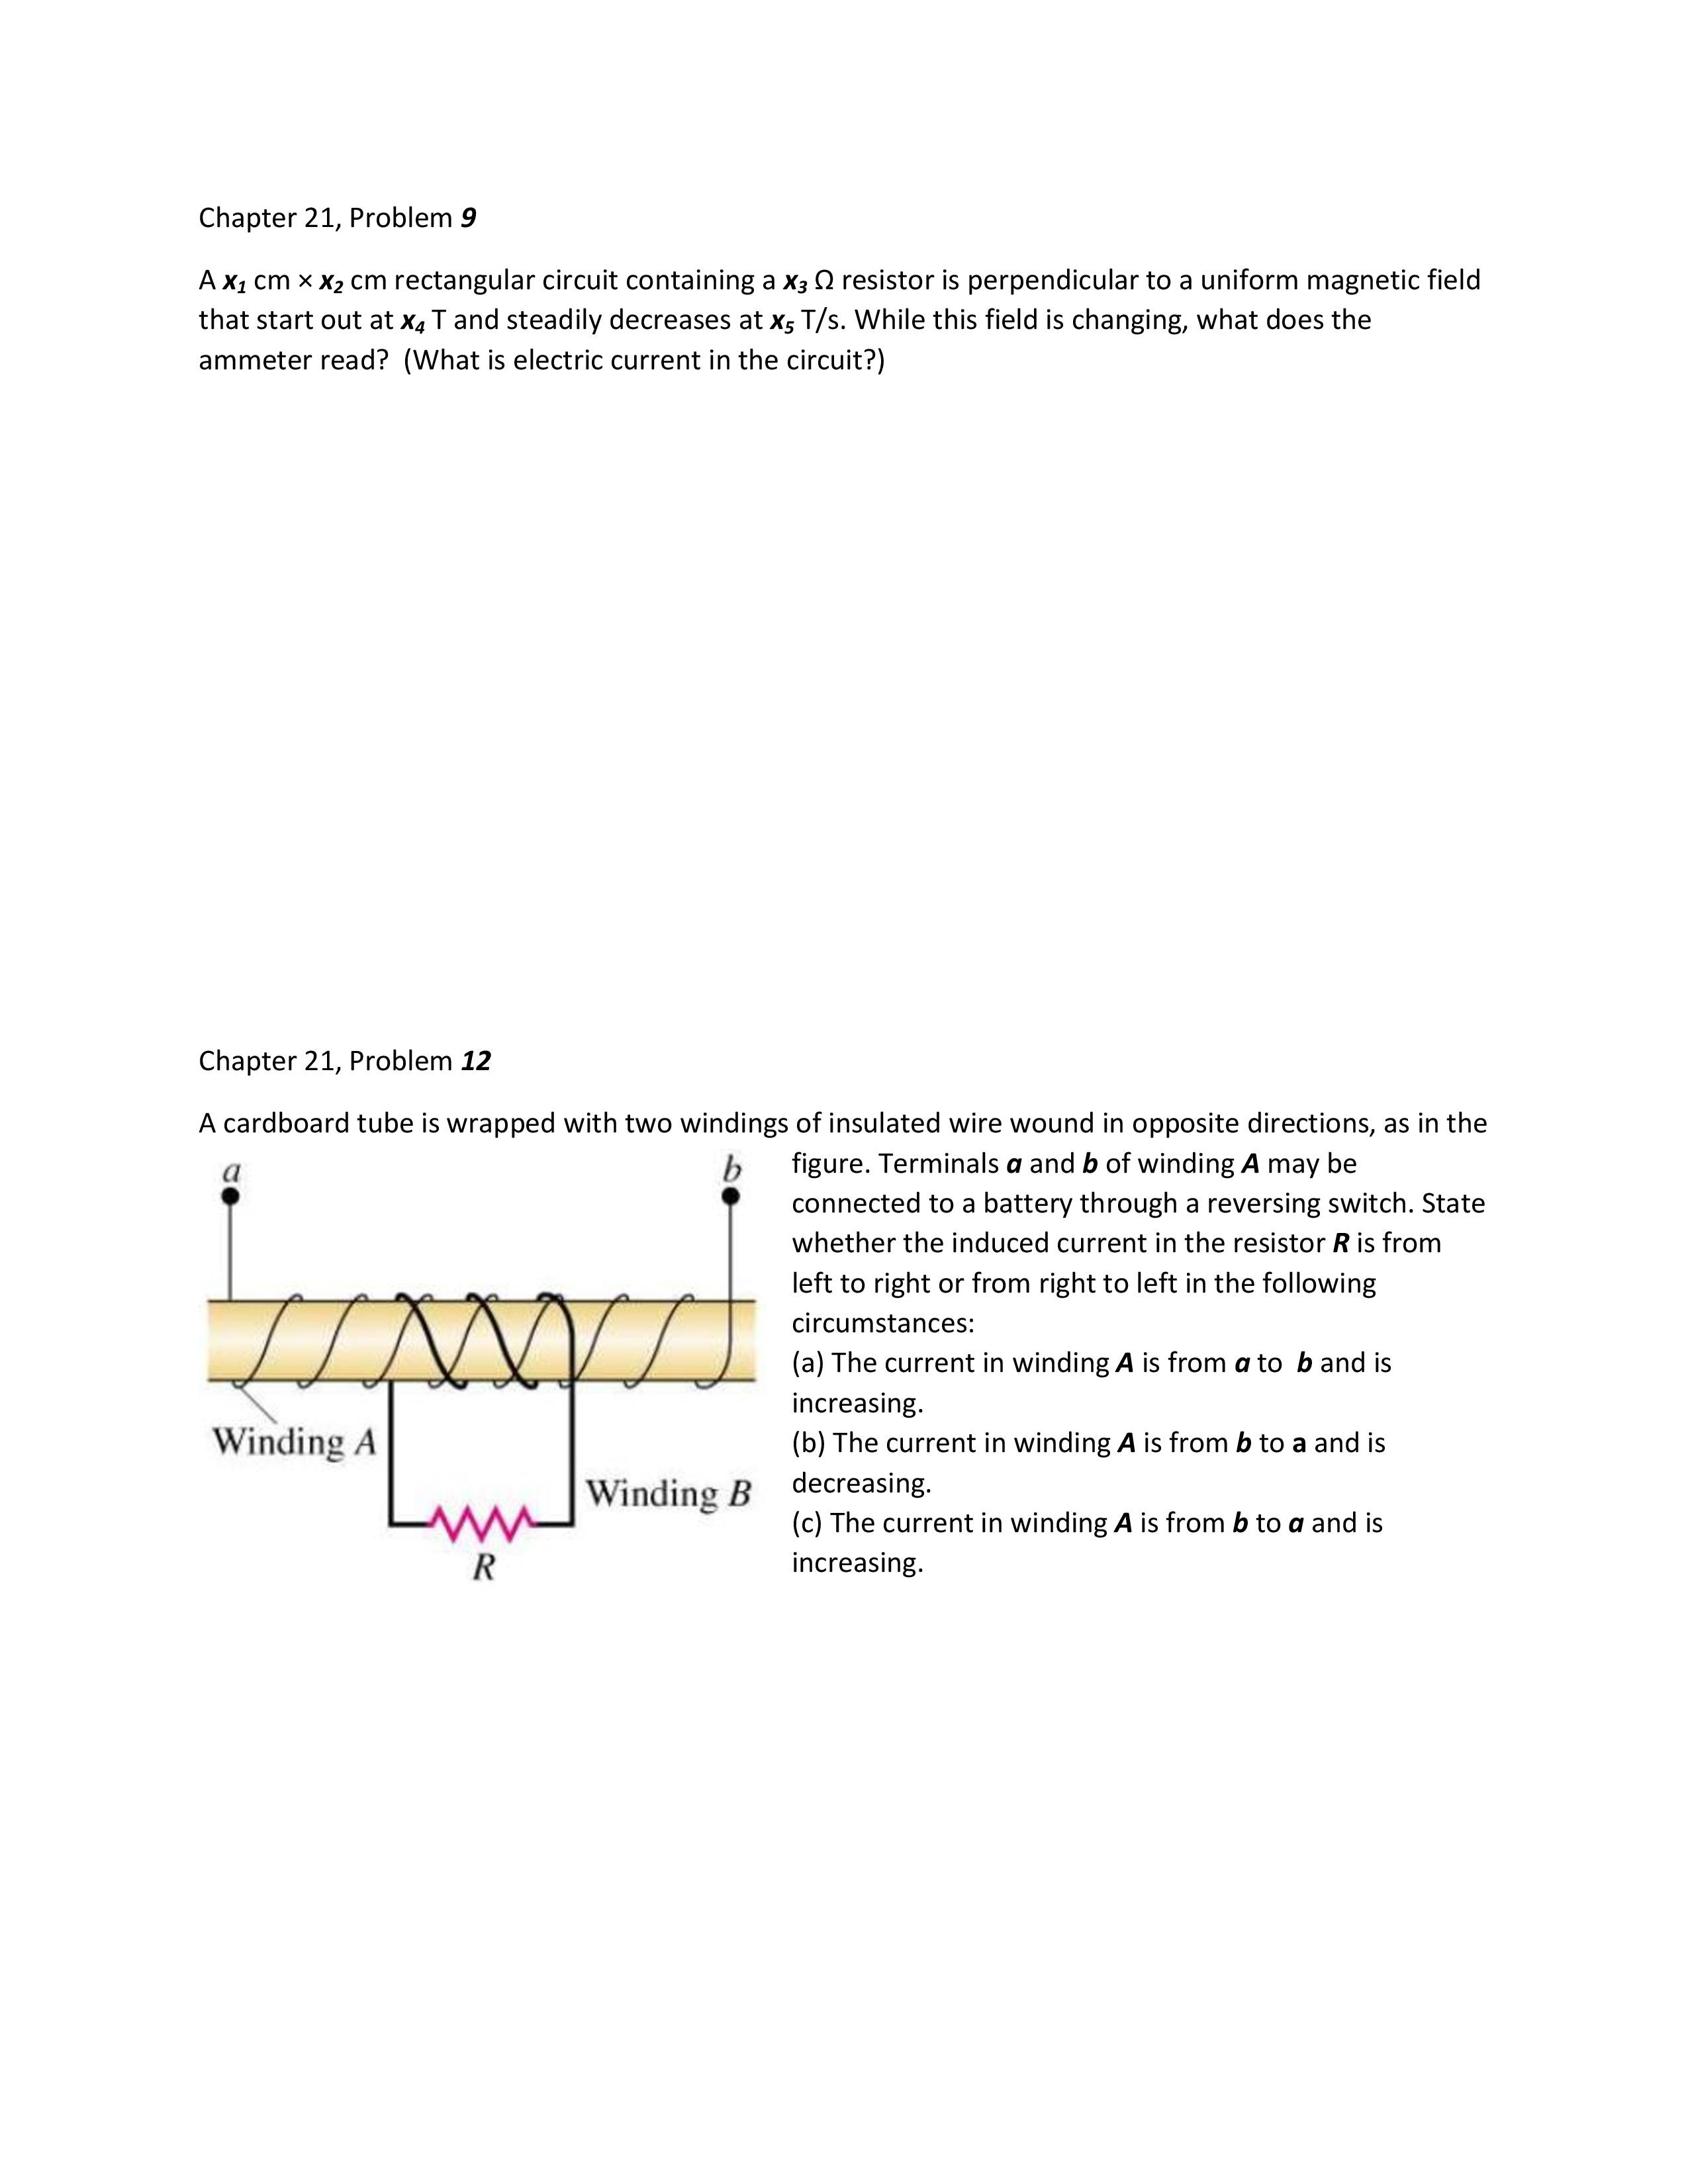 Chapter 21 Electromagnetic Induction Homework Worksheet